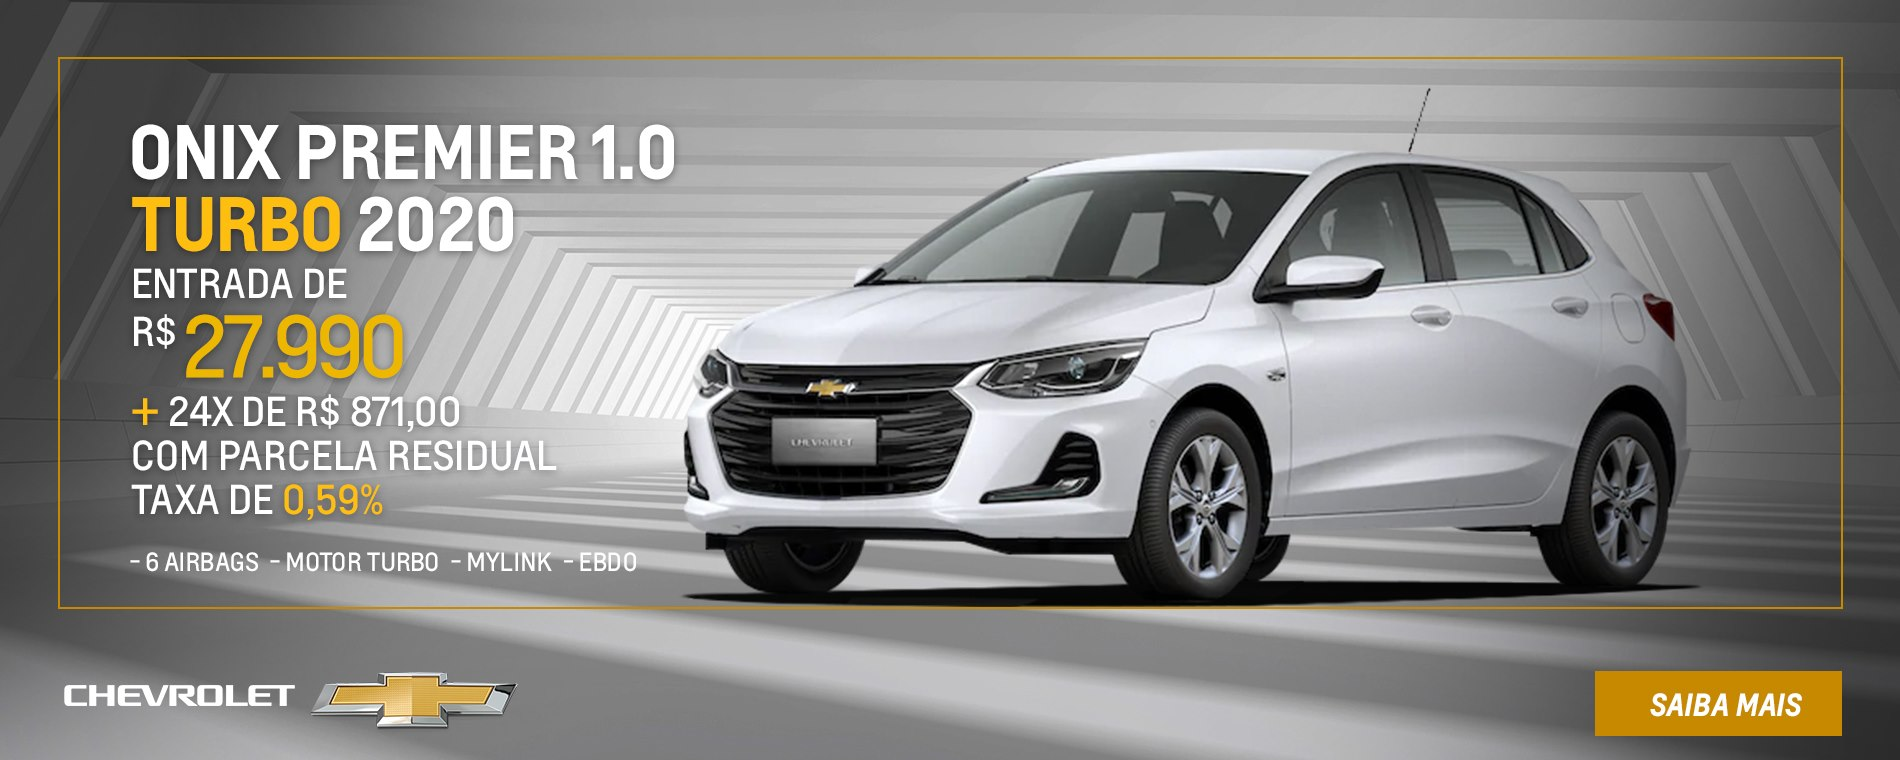 149_West-Motors_Onix-Premier-1.0-Turbo-2020_DestaqueDesk